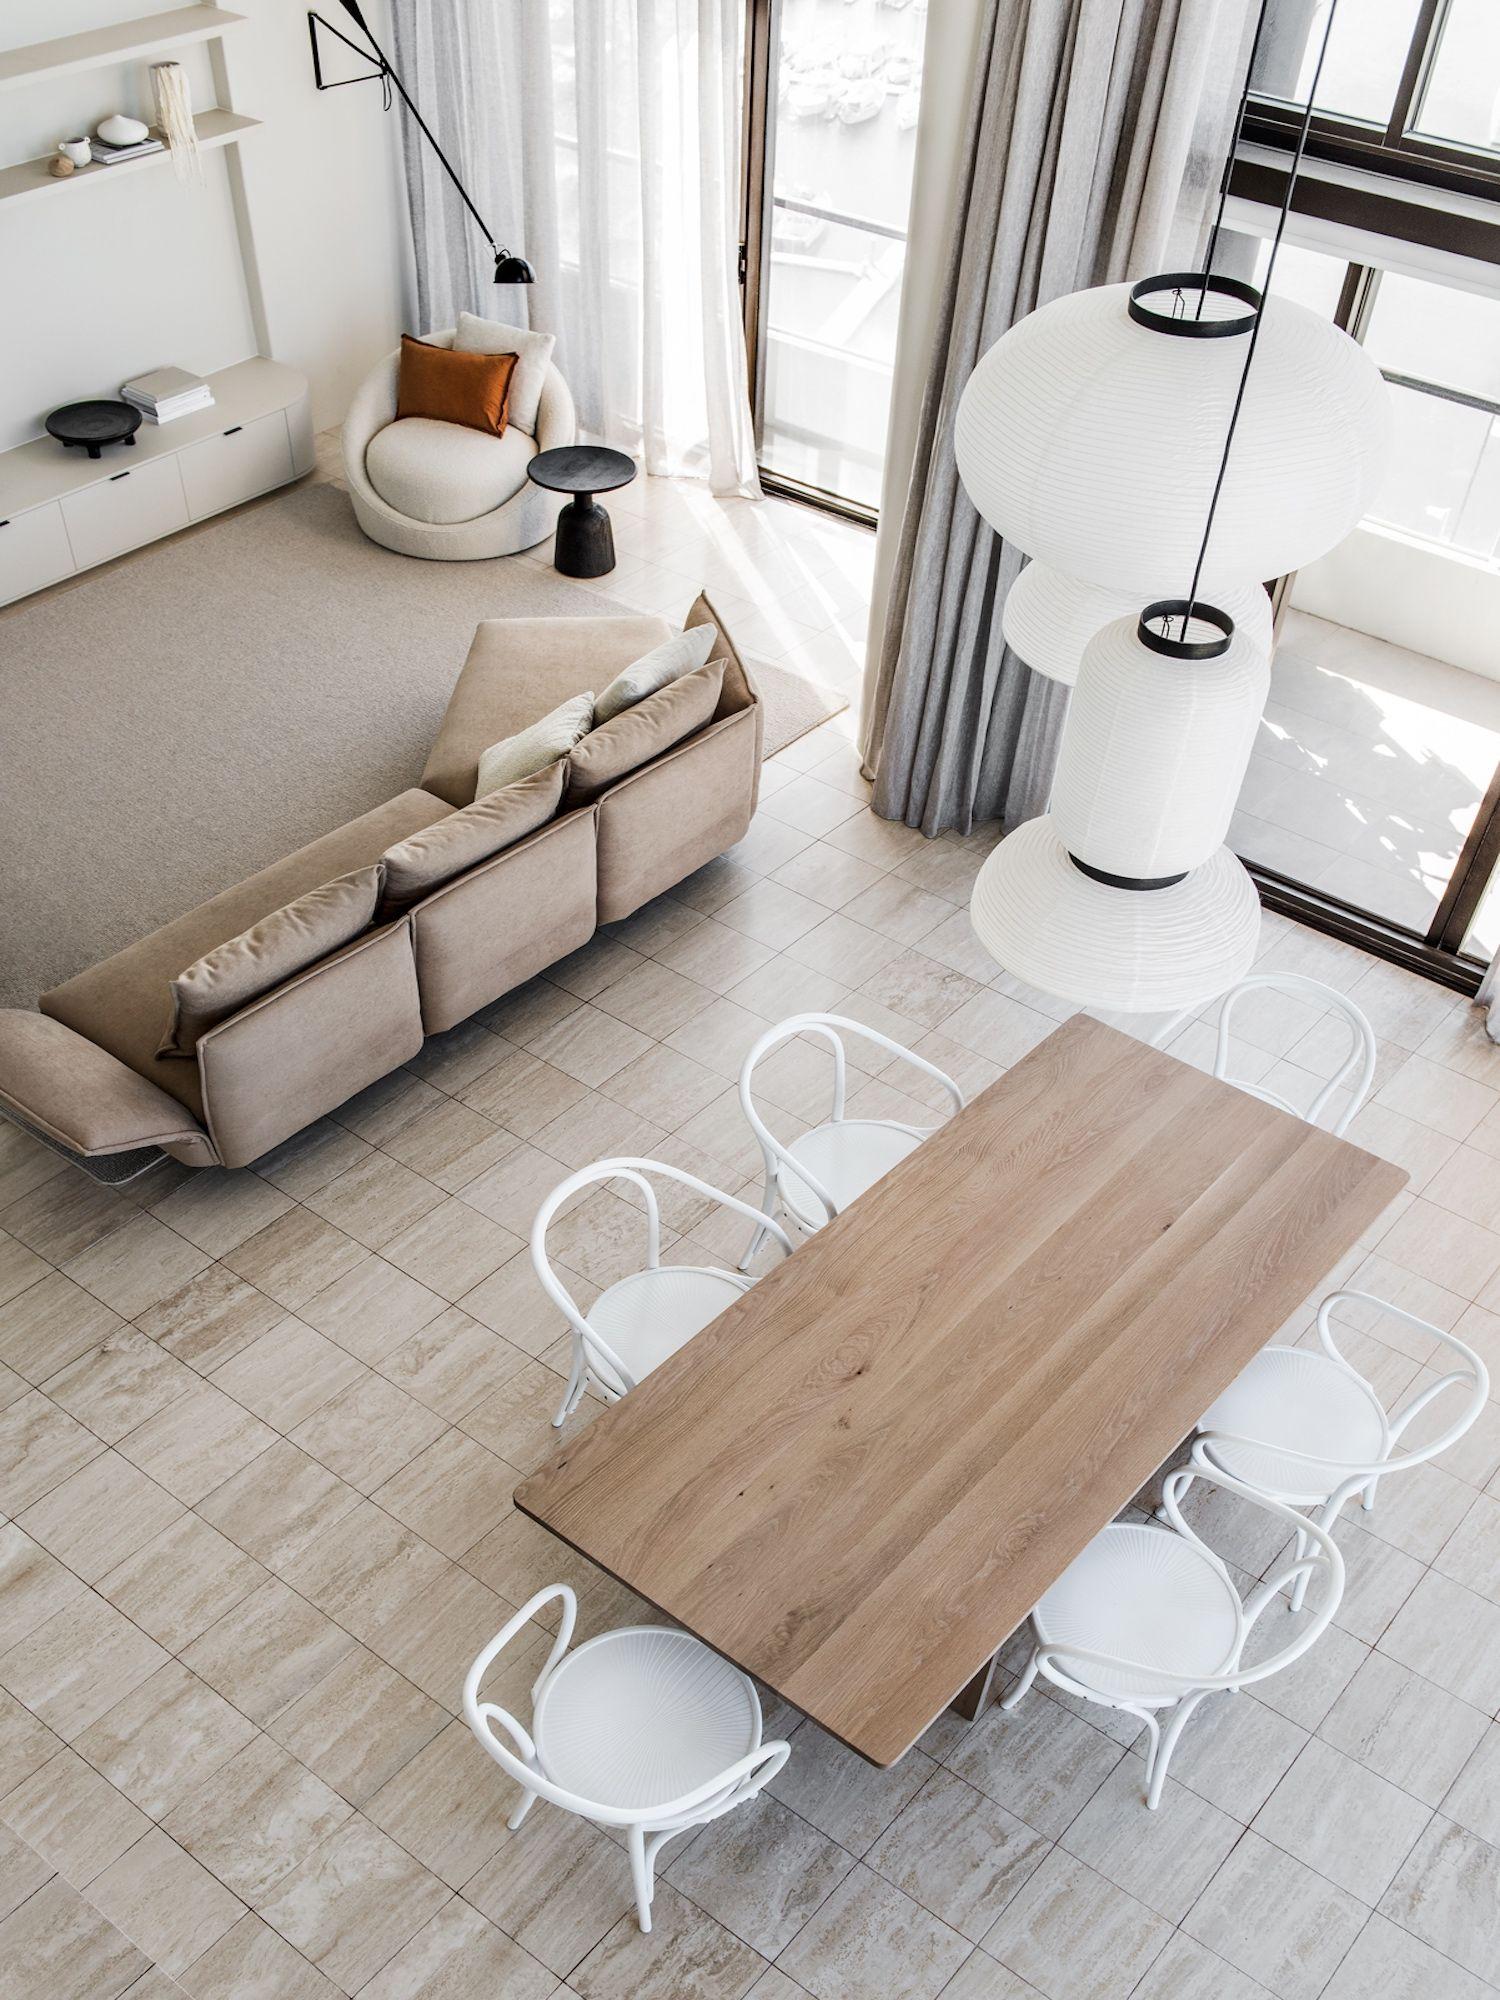 Queensland Penthouse by CJH Studio in 2020 Interior